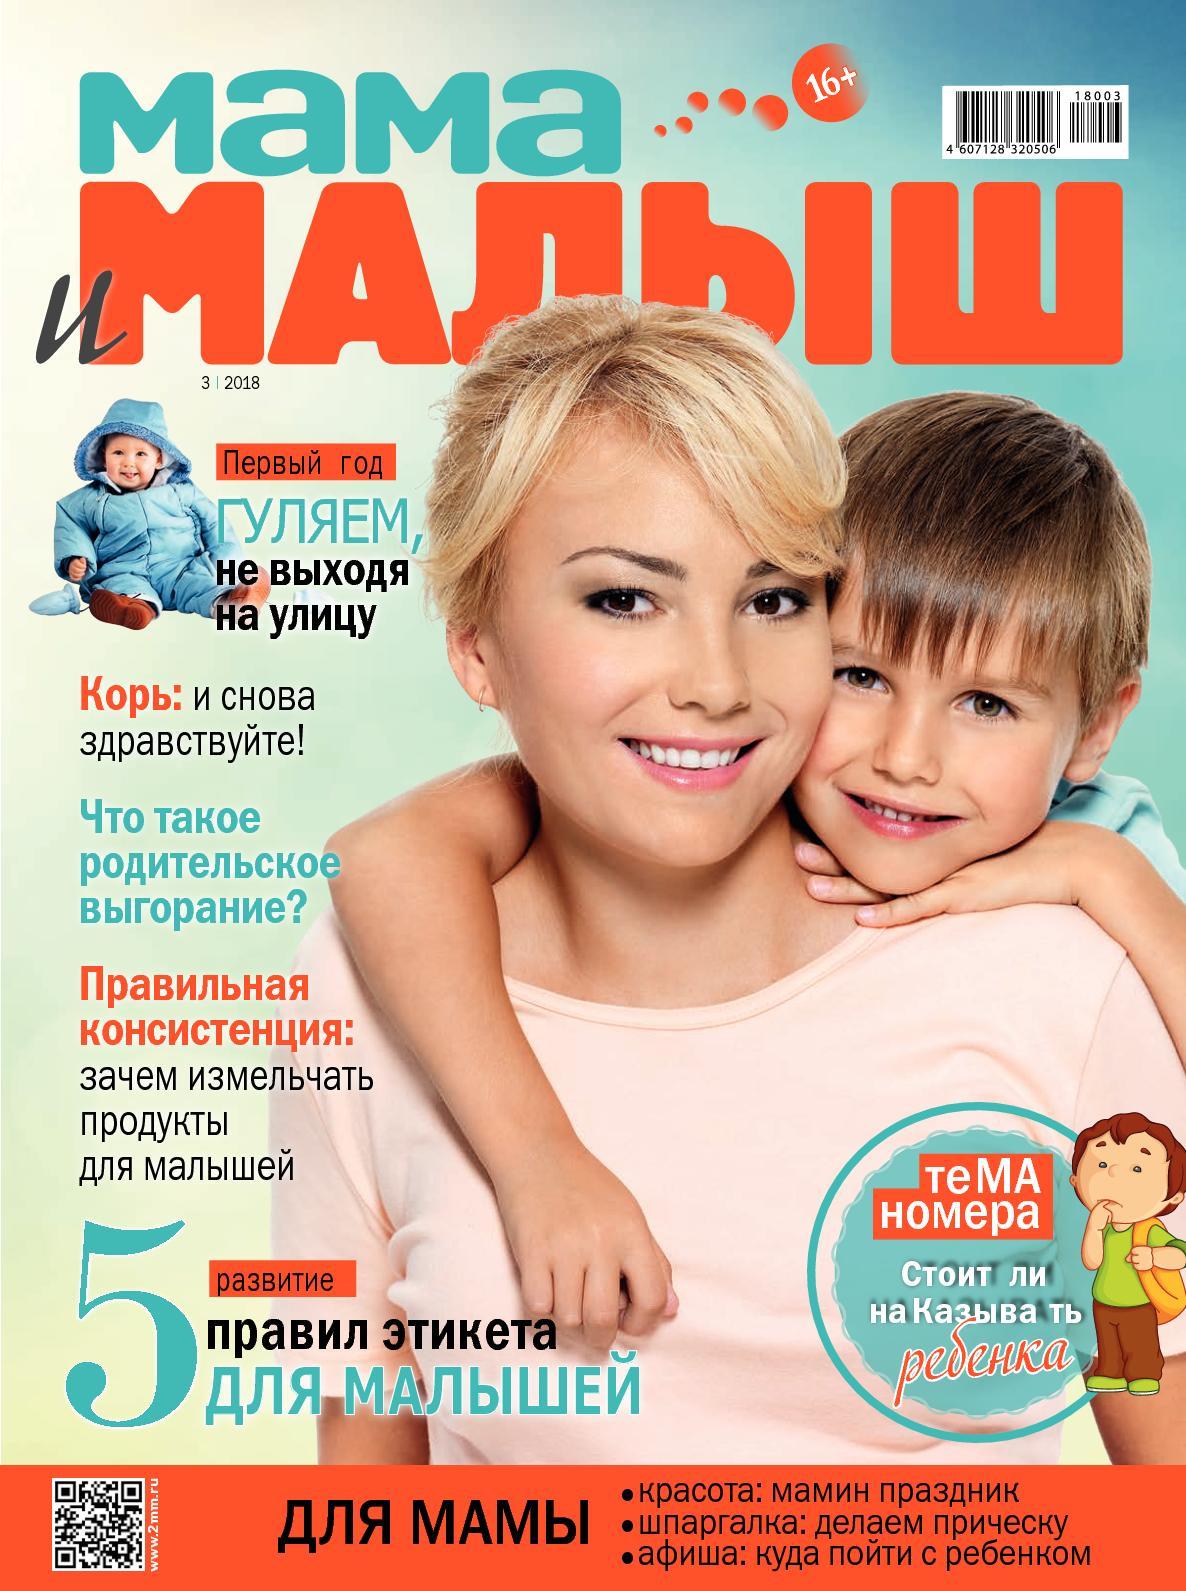 """Мама и малыш"" №3/2018"